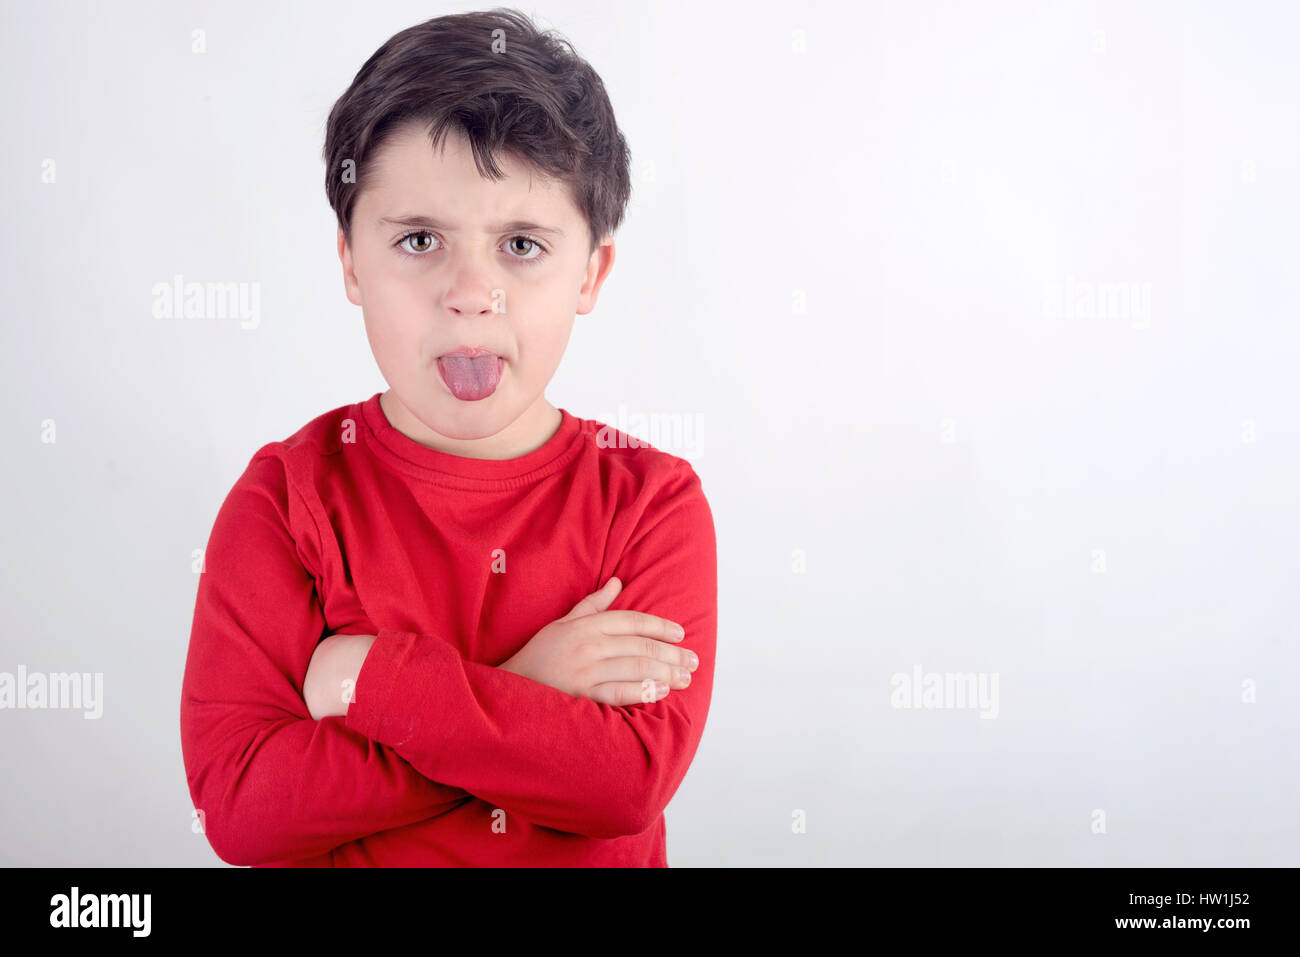 Rude child - Stock Image